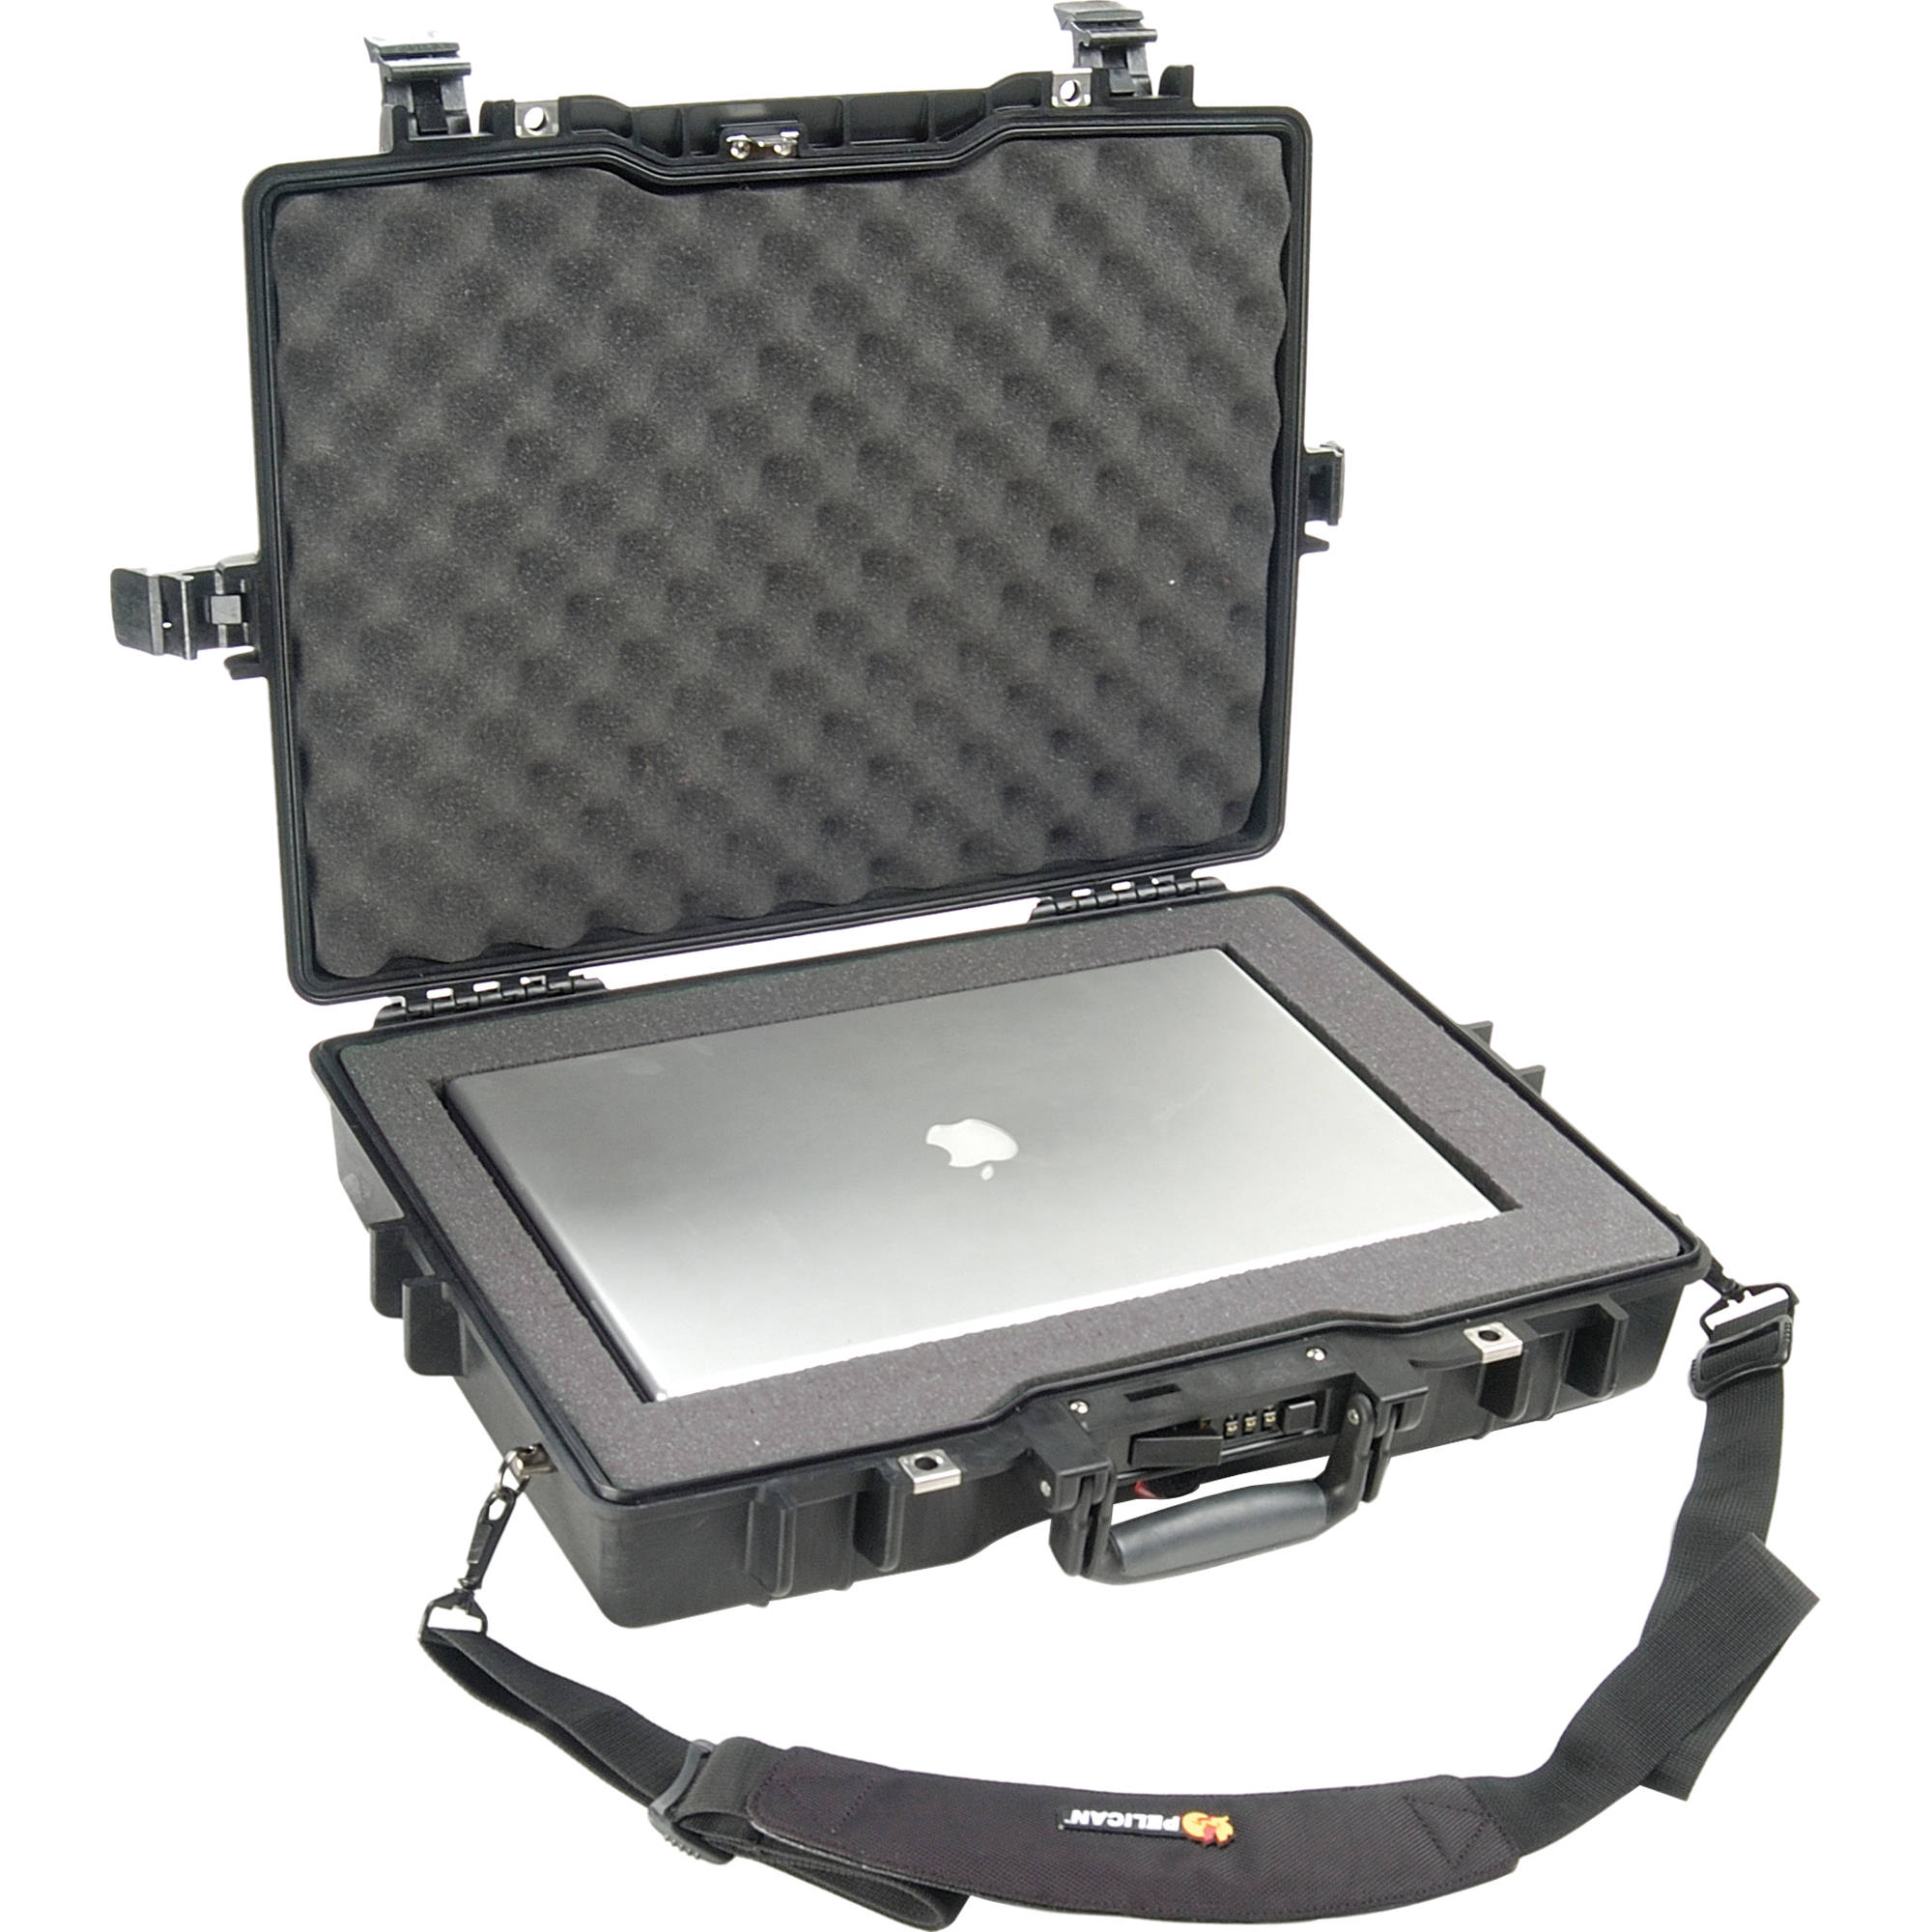 sports shoes 18129 853f9 Pelican 1495 Laptop Computer Case with Foam (Desert Tan)